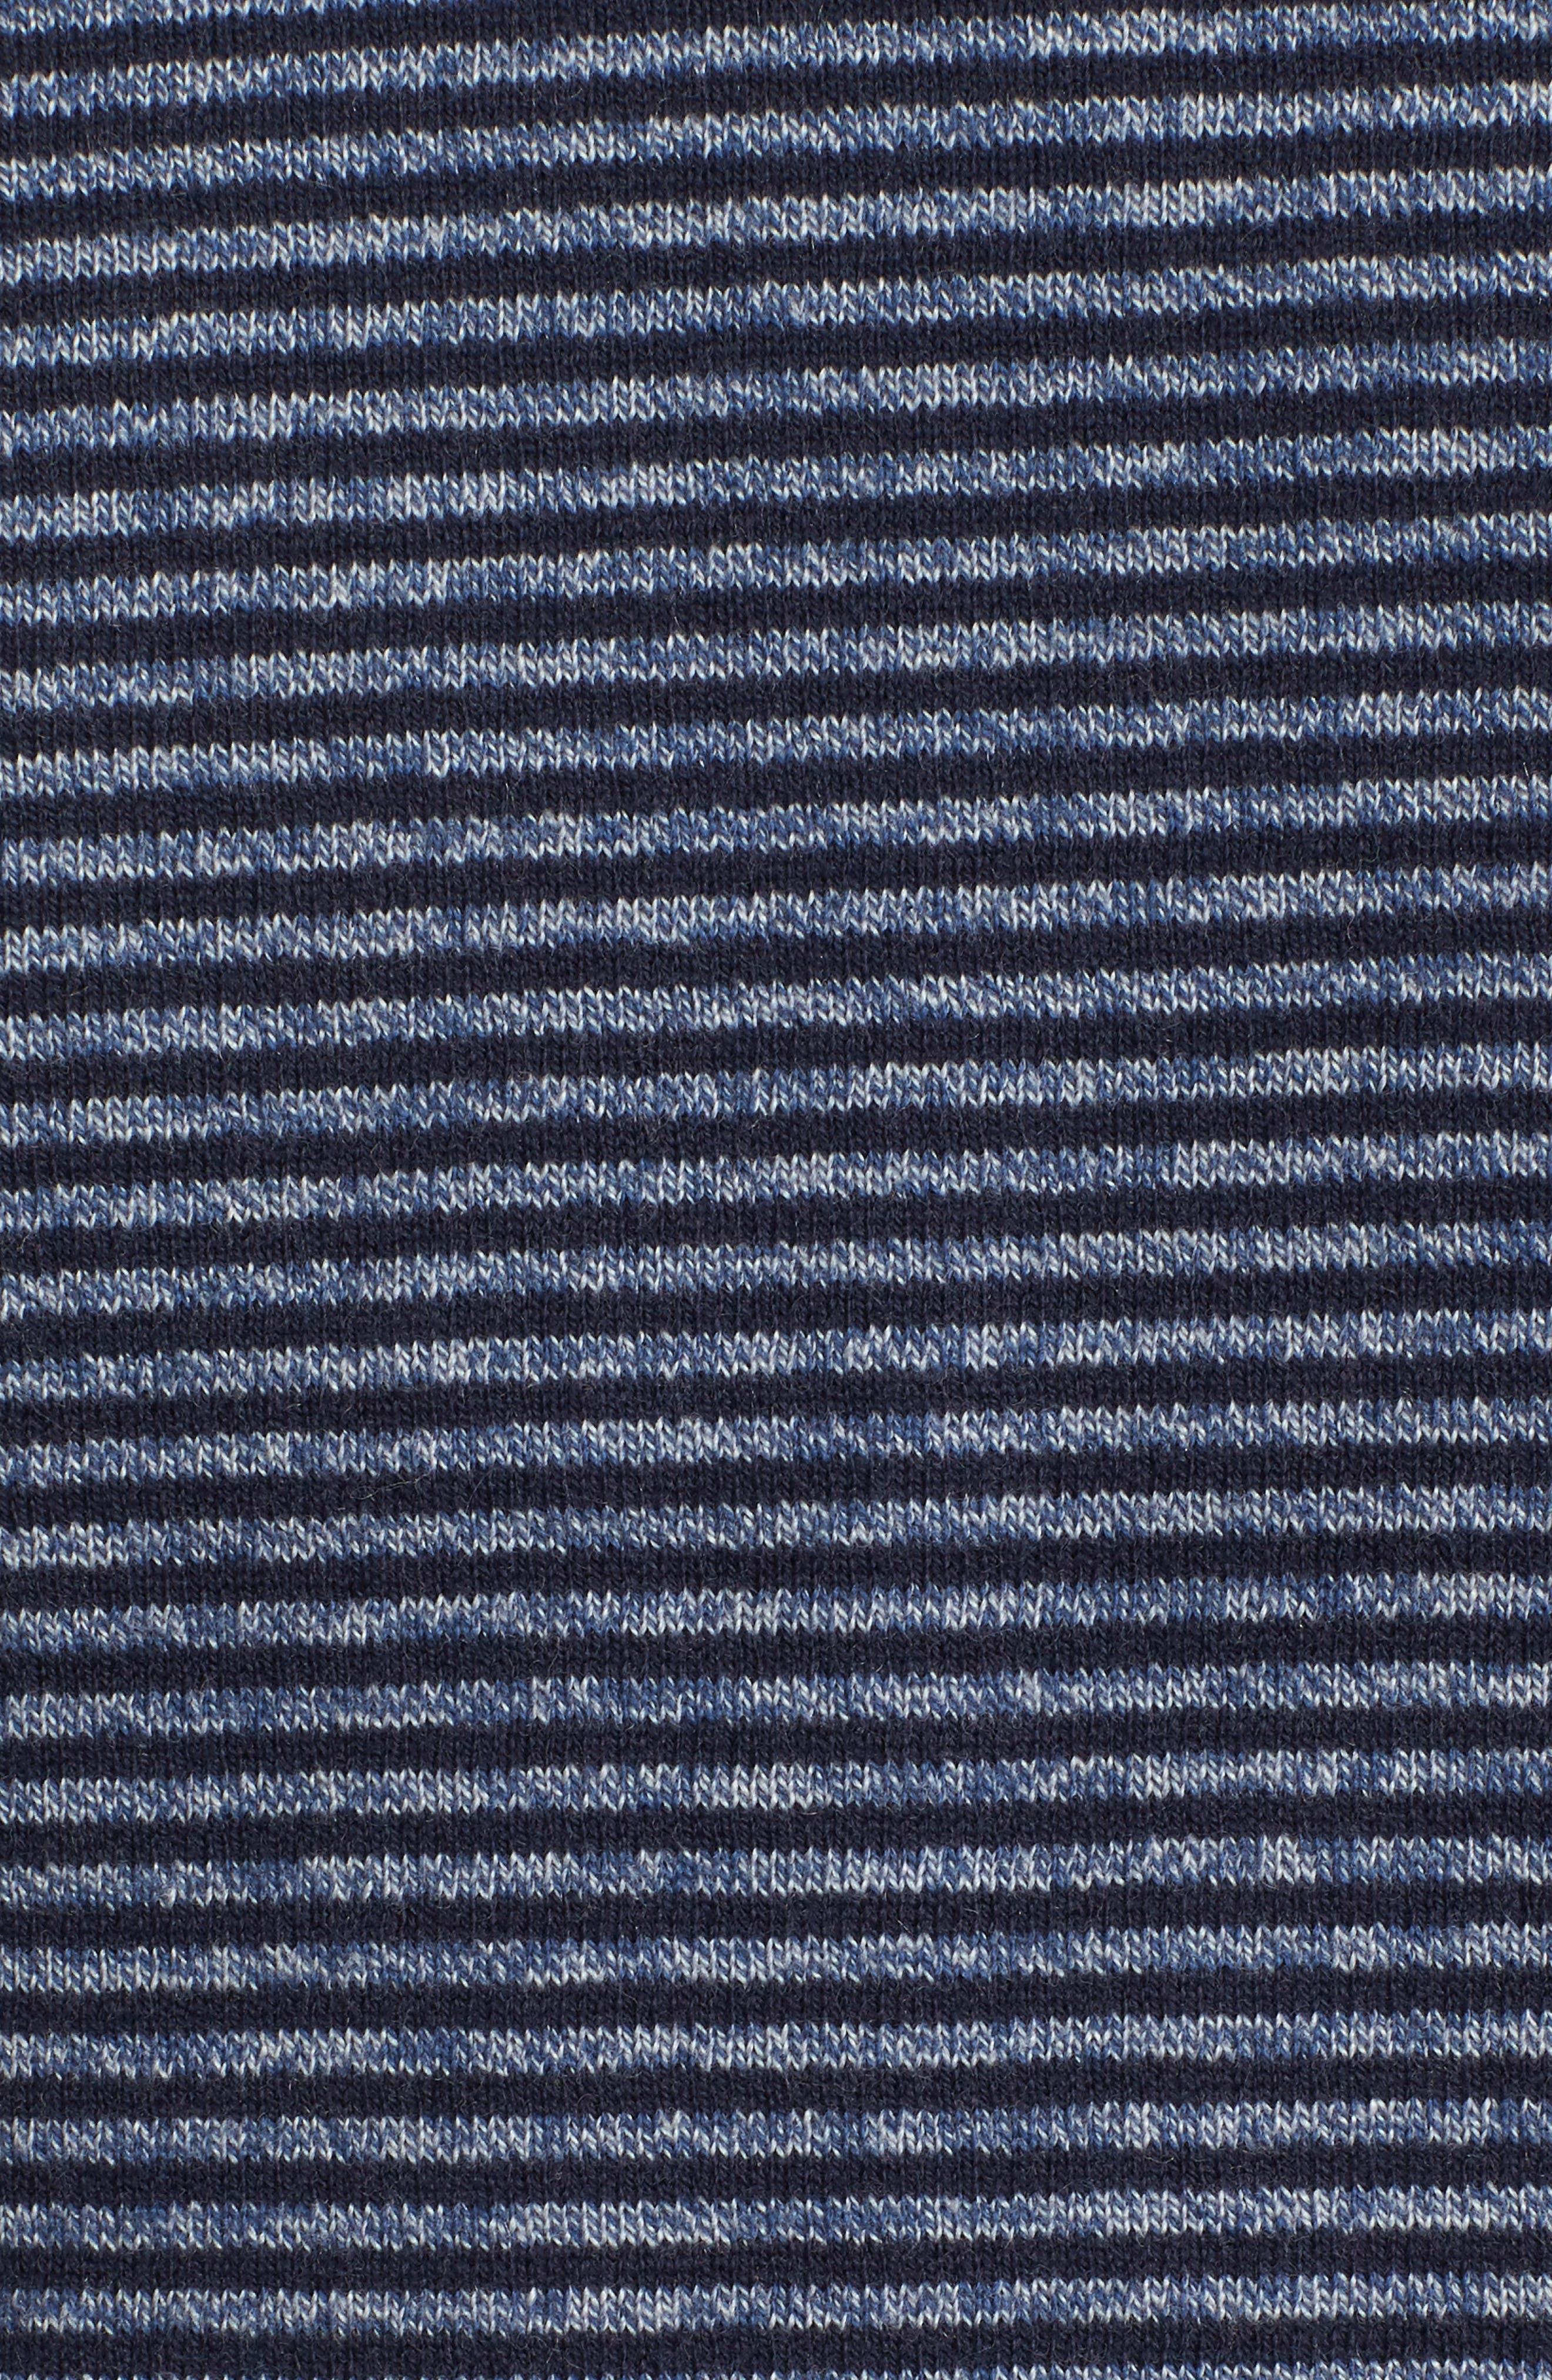 Stripe Cotton & Cashmere Crewneck Sweater,                             Alternate thumbnail 5, color,                             Navy Iris Jaspe Stripe